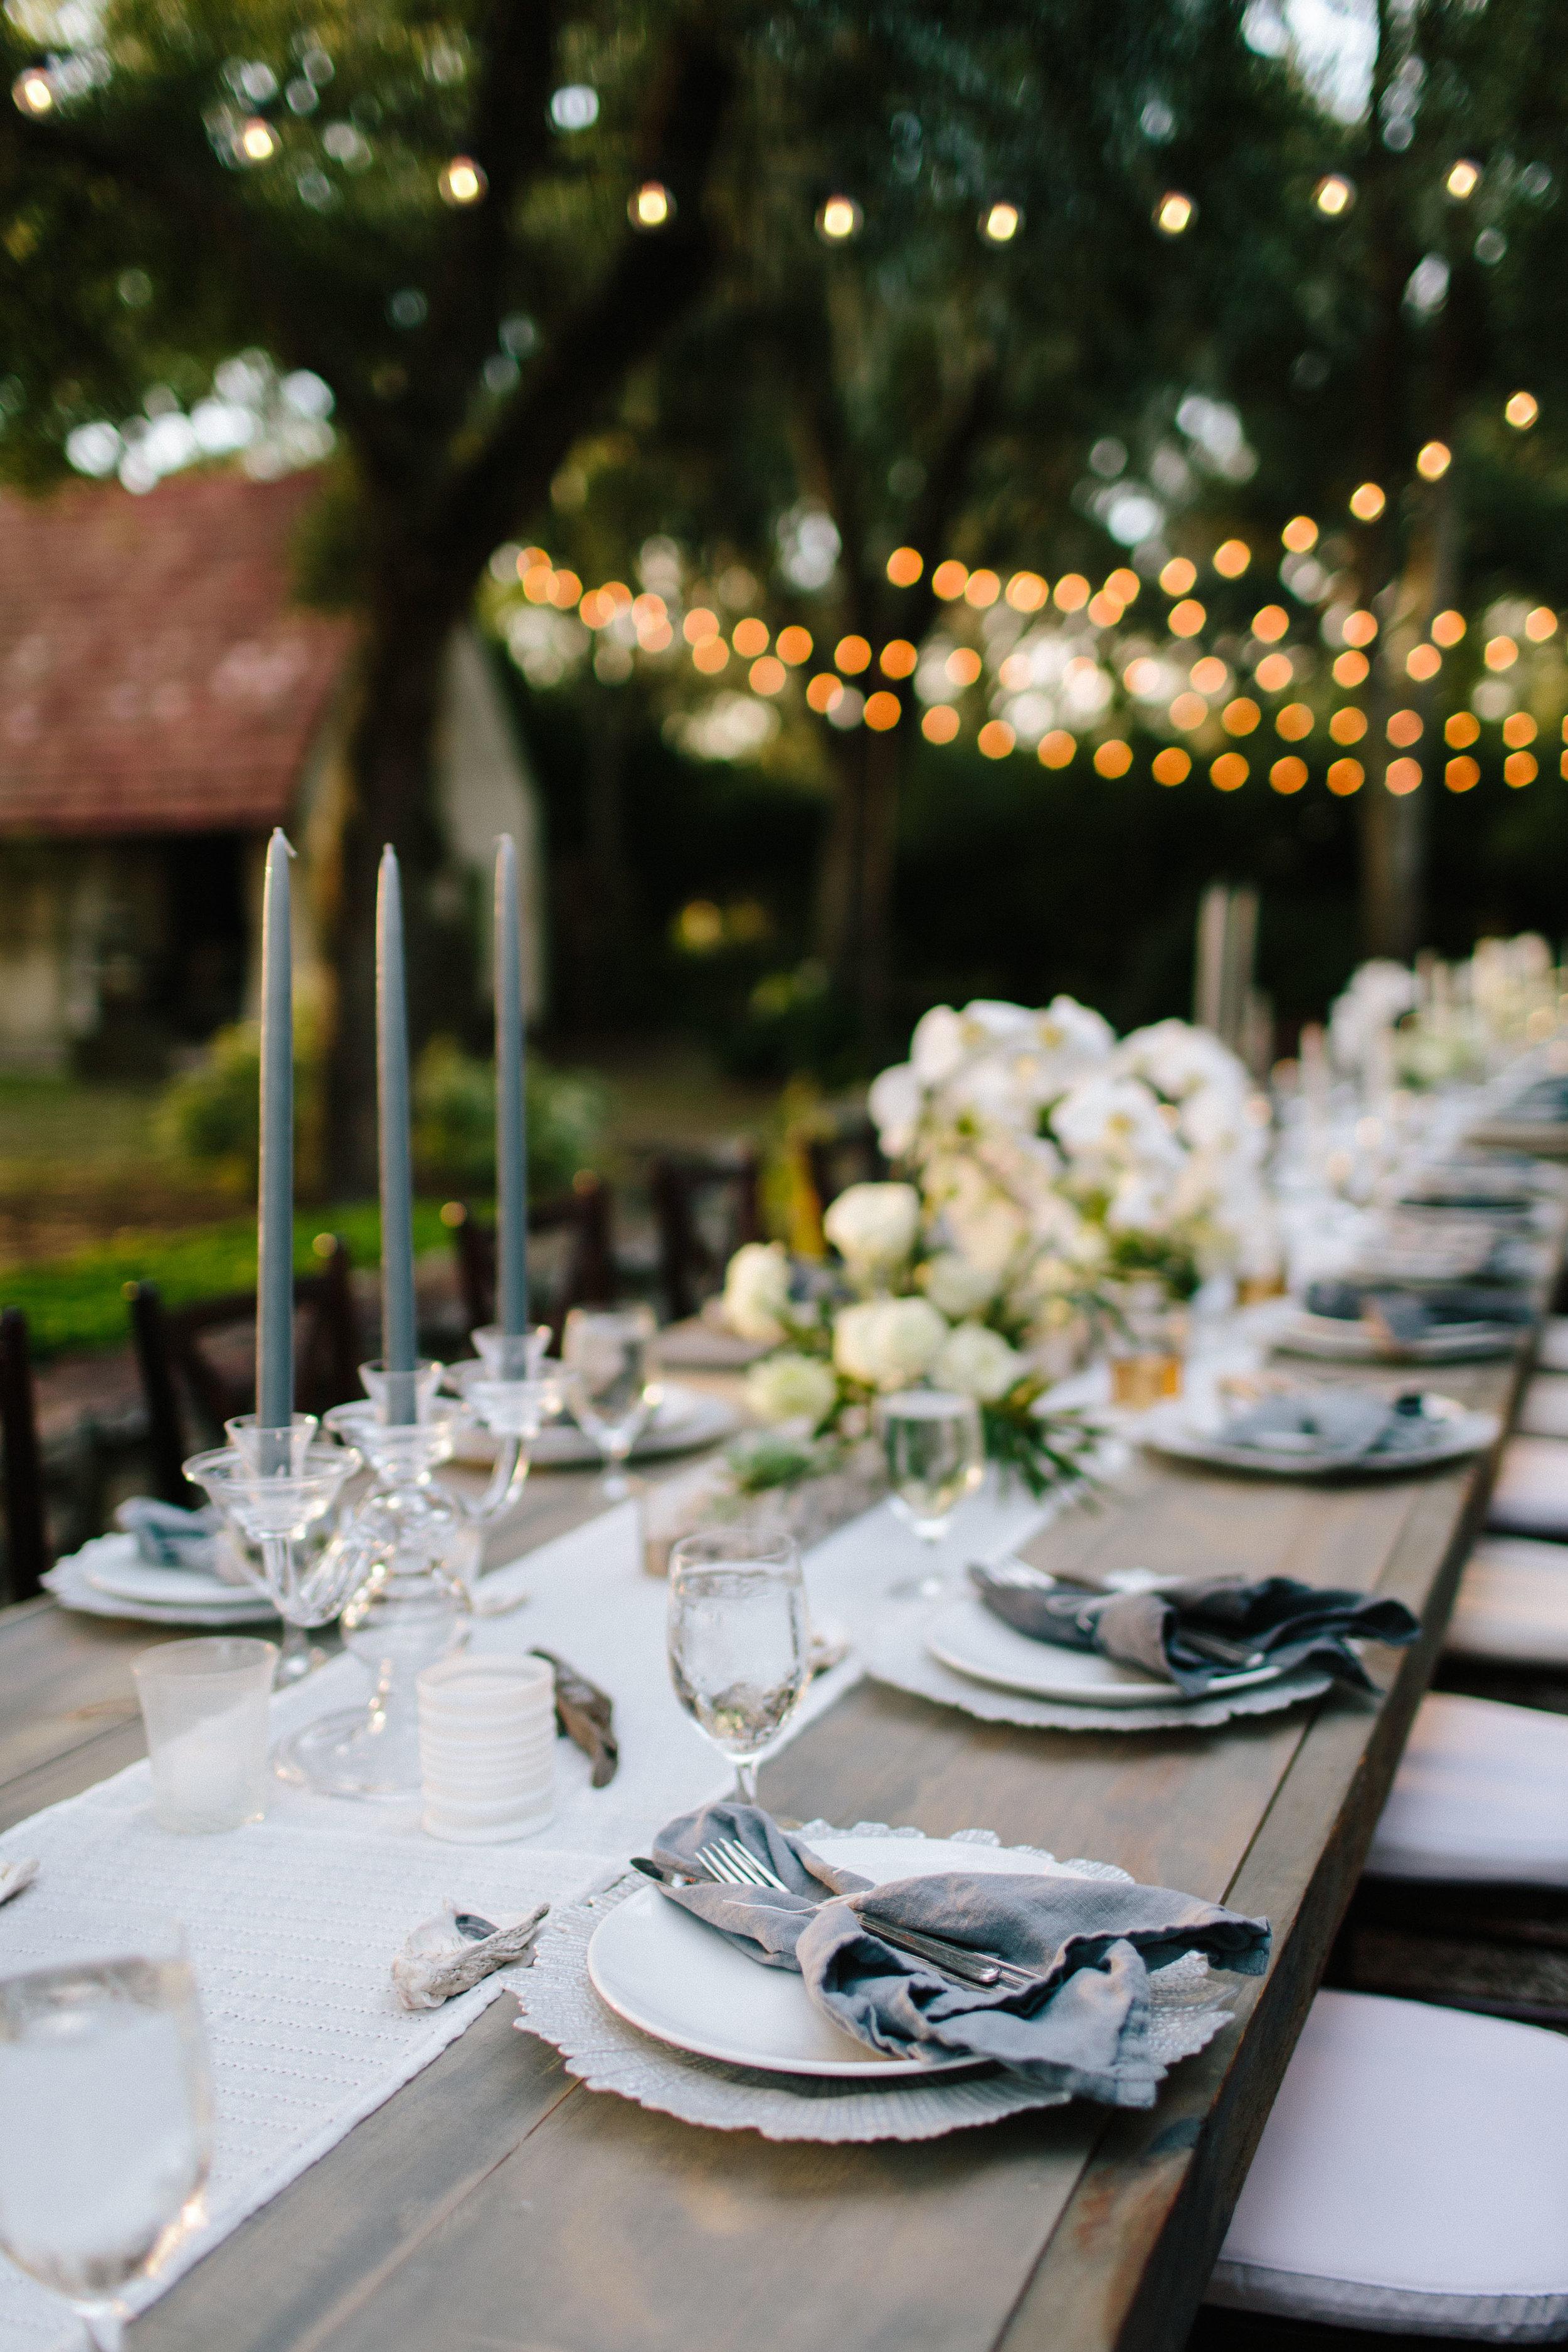 Natalie & Court Waterfront Wedding at RiverOaks Charleston - Awendaw, SC